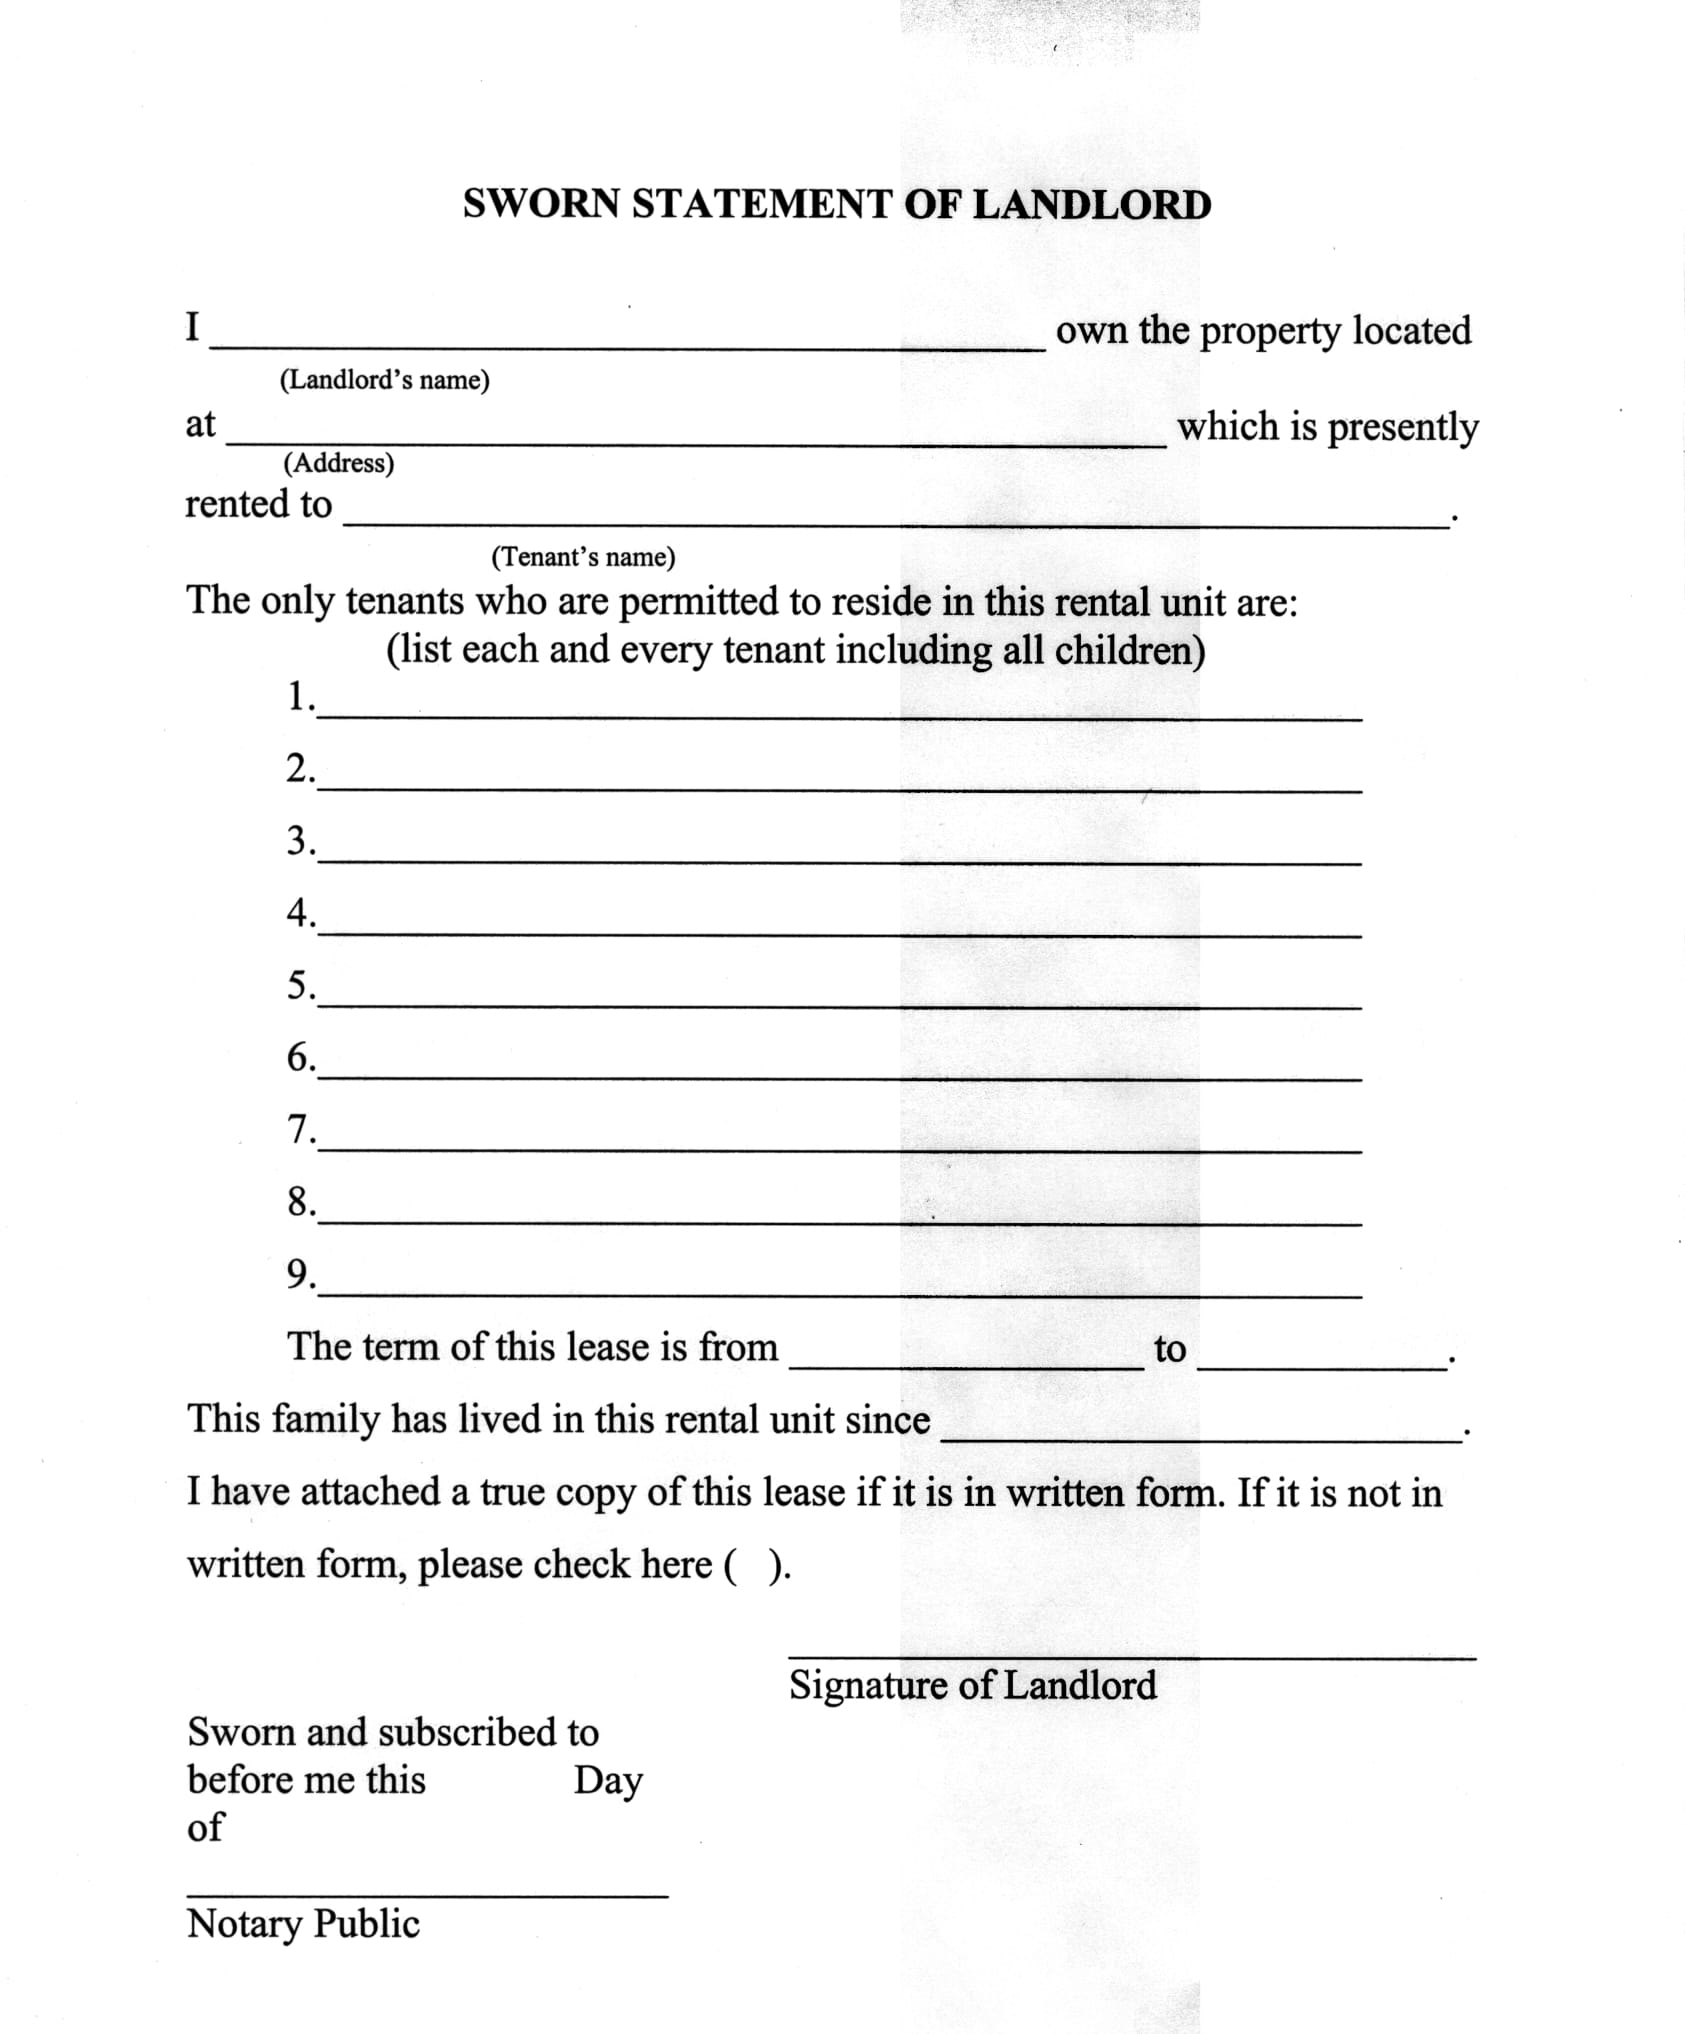 landlord sworn statement form 1